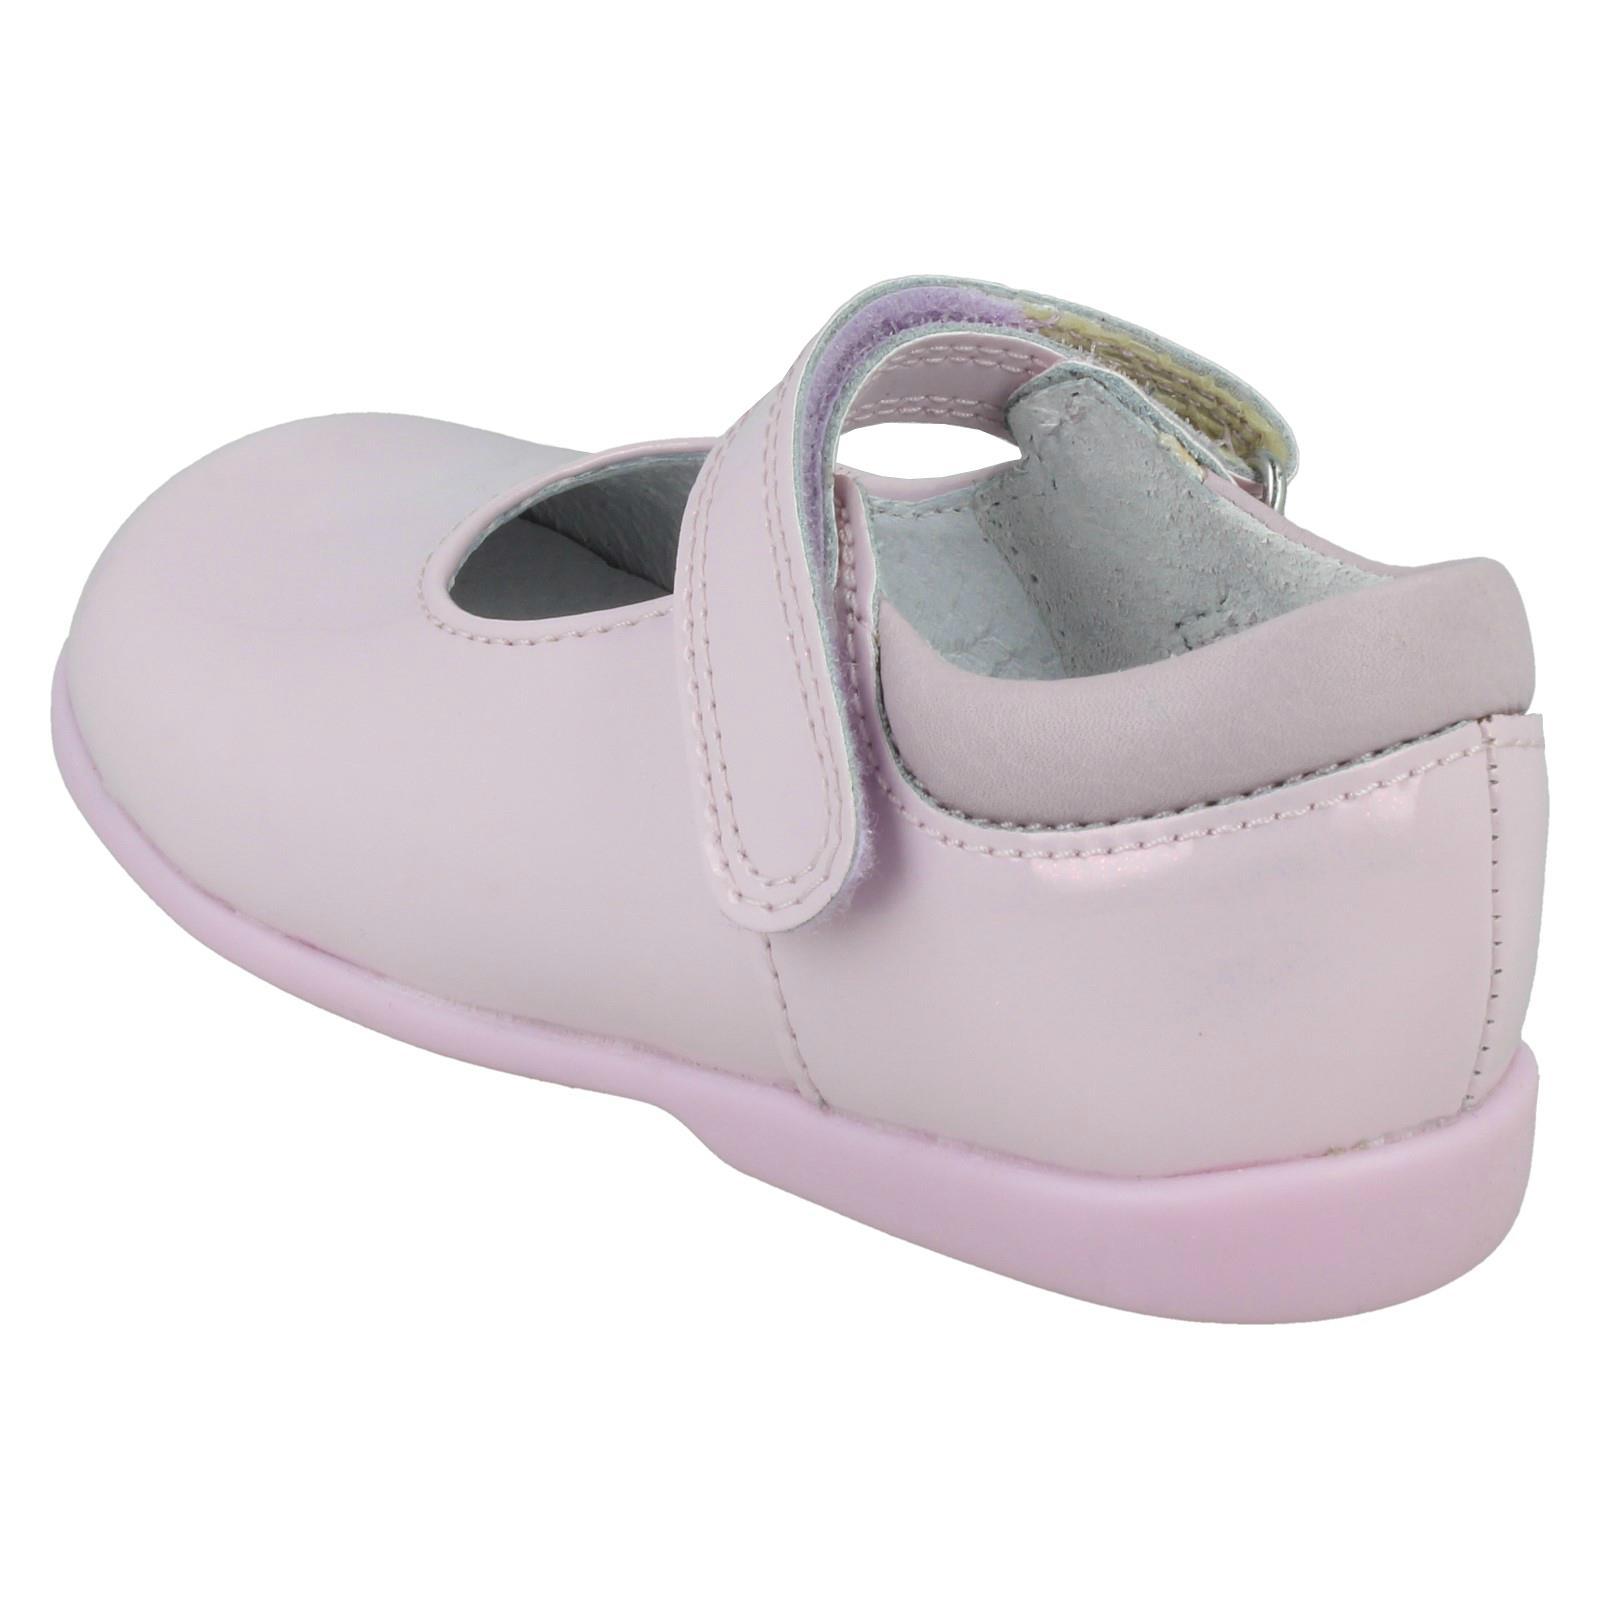 Girls Startrite Slide Mary Jane Smart Shoes